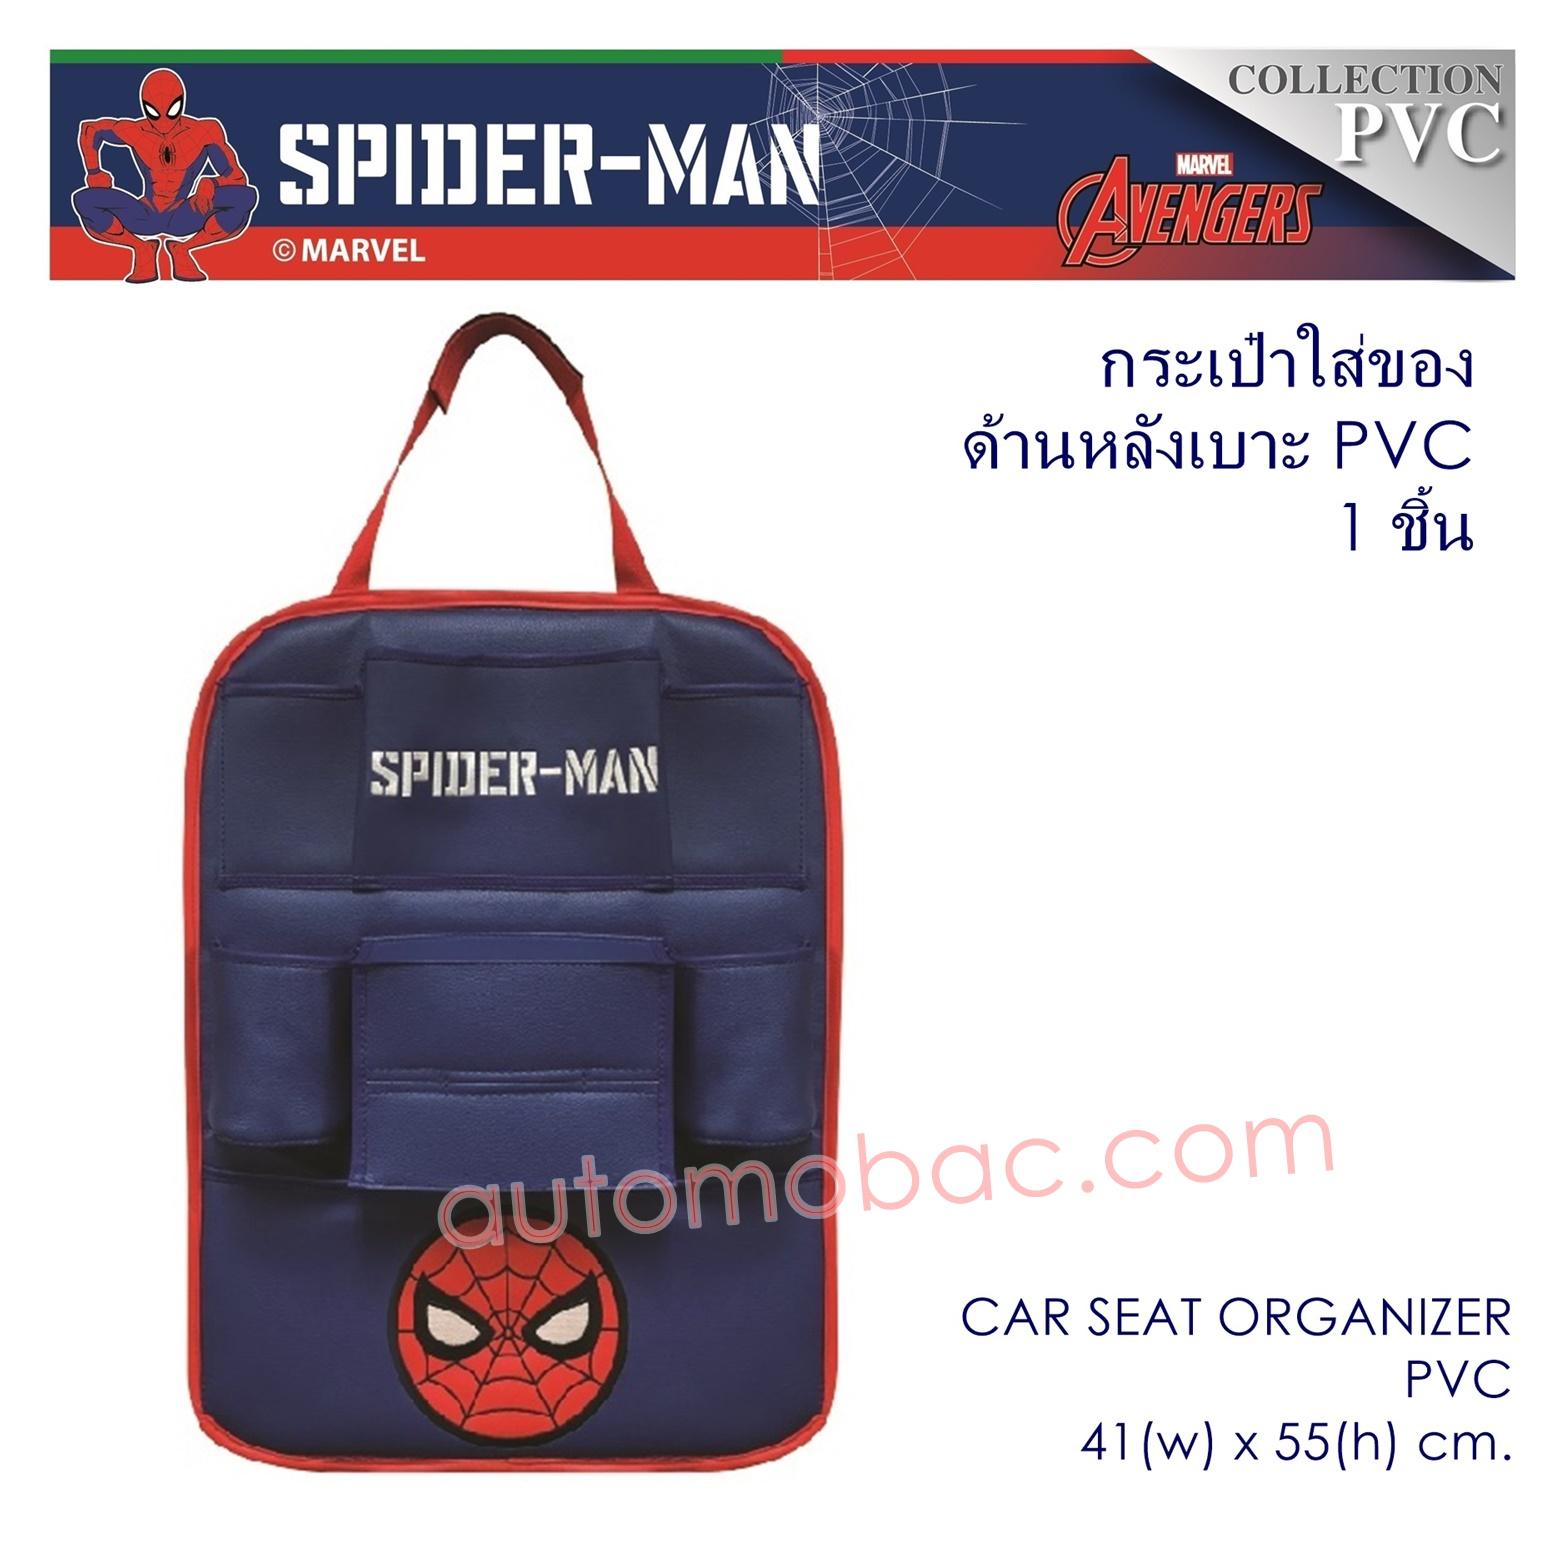 Spider-man กระเป๋าอเนกประสงค์หลังเบาะ PCV มีที่ใส่ทิชชู ที่ใส่แก้วน้ำ ช่วยจัดระเบียบภายในรถ